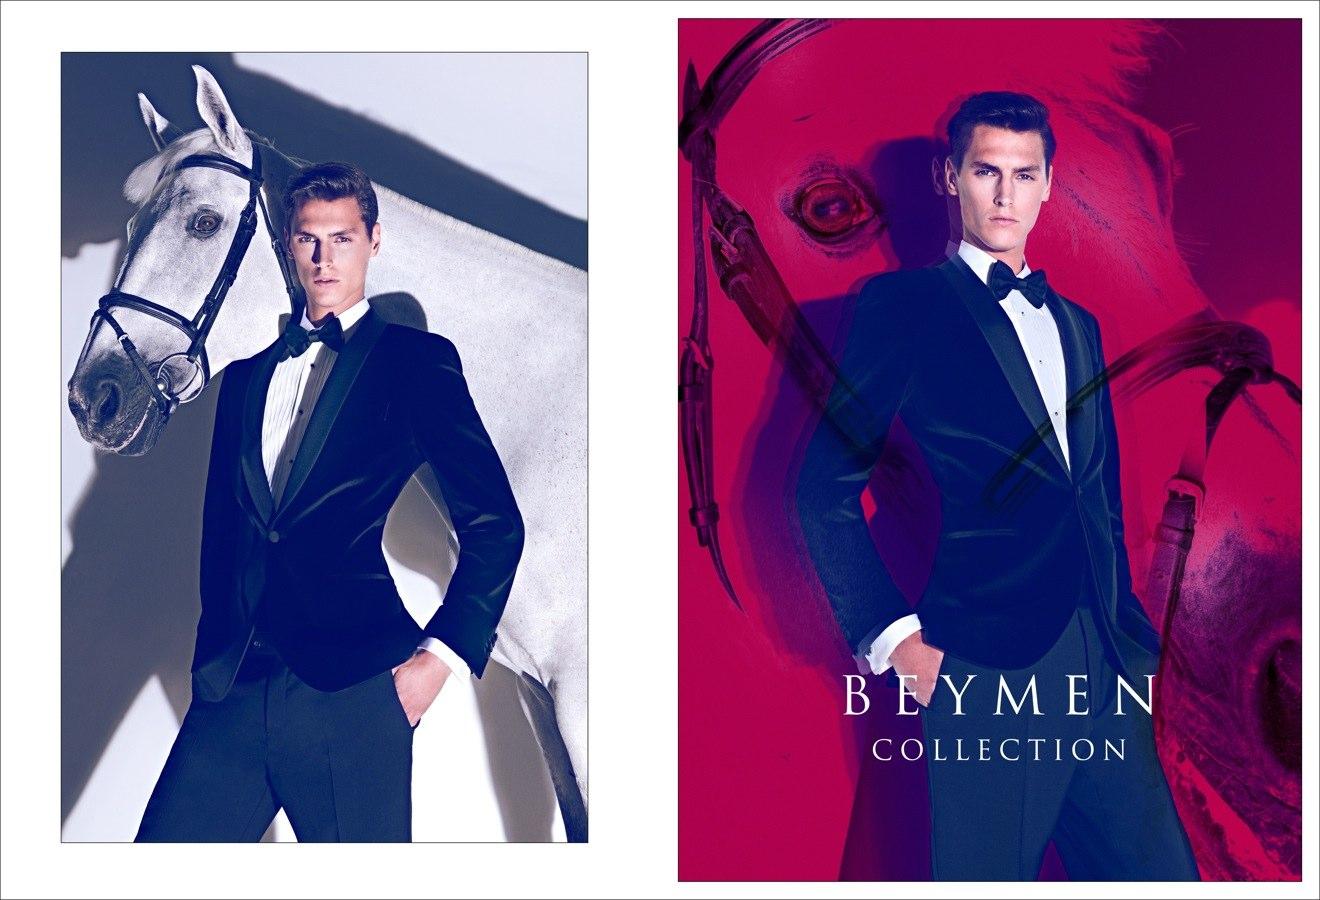 beymen_collection_11_FW_02